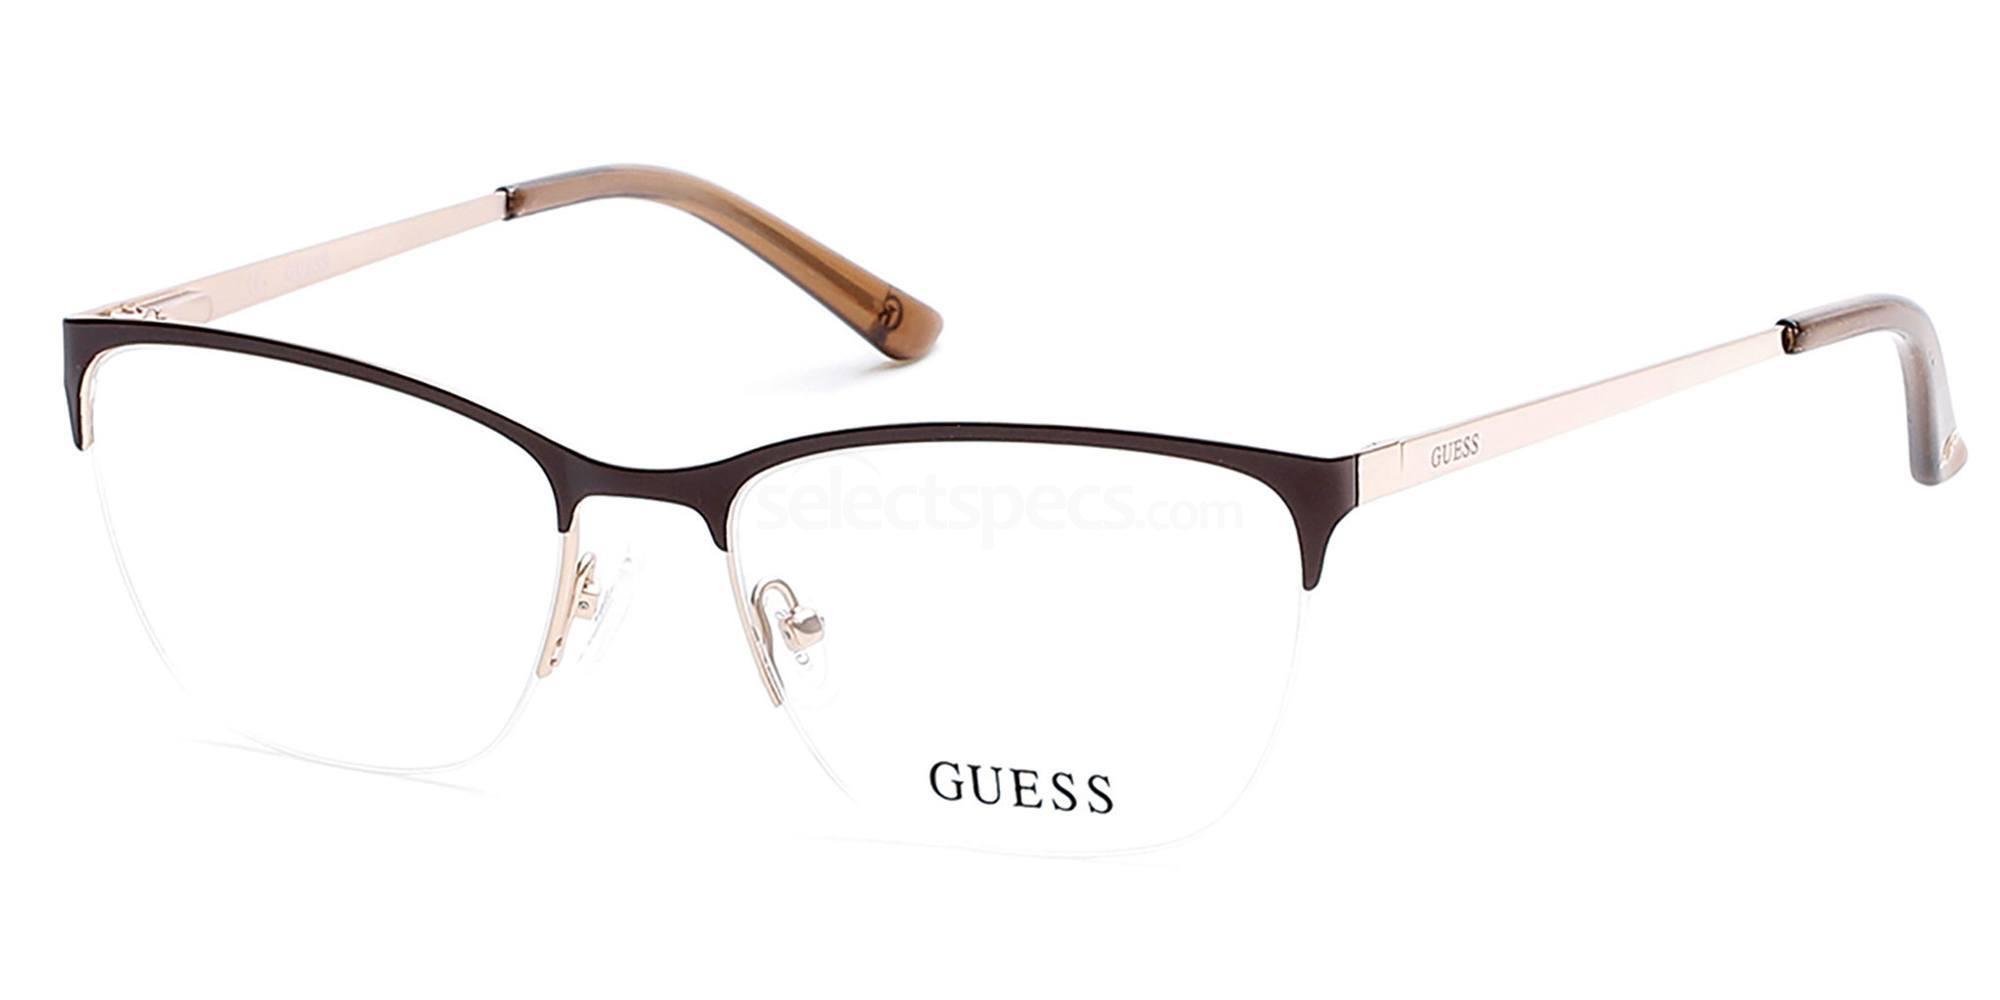 045 GU2543 Glasses, Guess